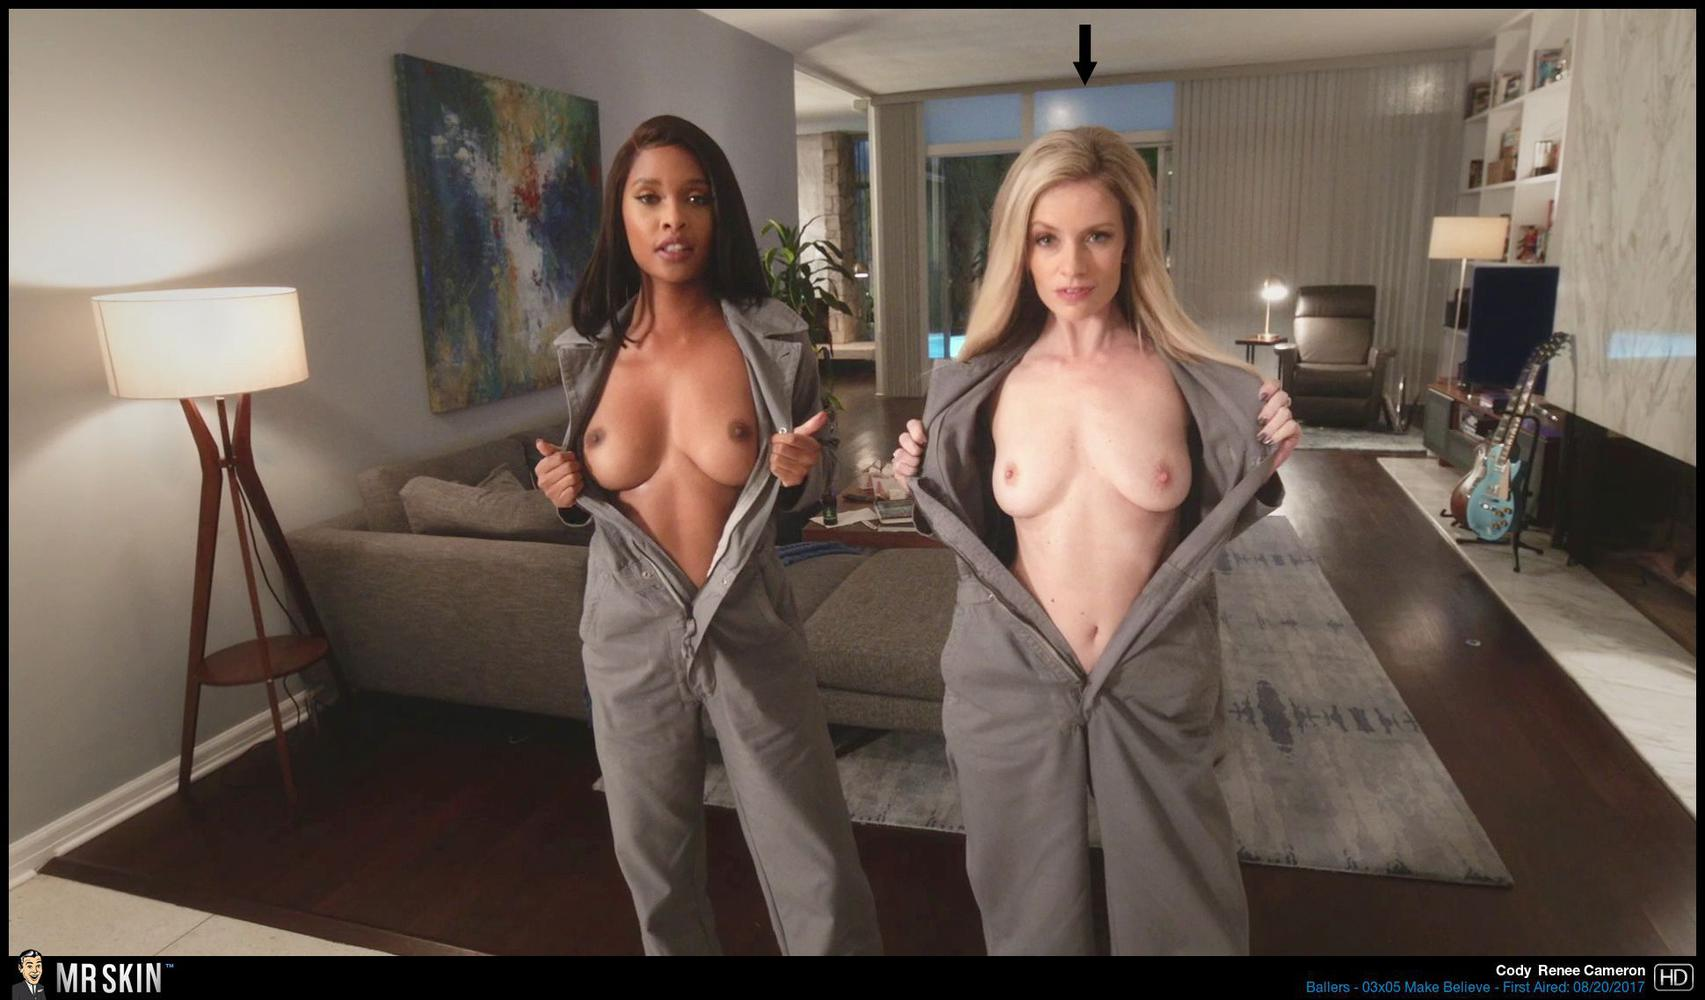 Angela Kinsey Nude Scene skincoming on dvd & blu-ray: half magic, ballers s3, & more